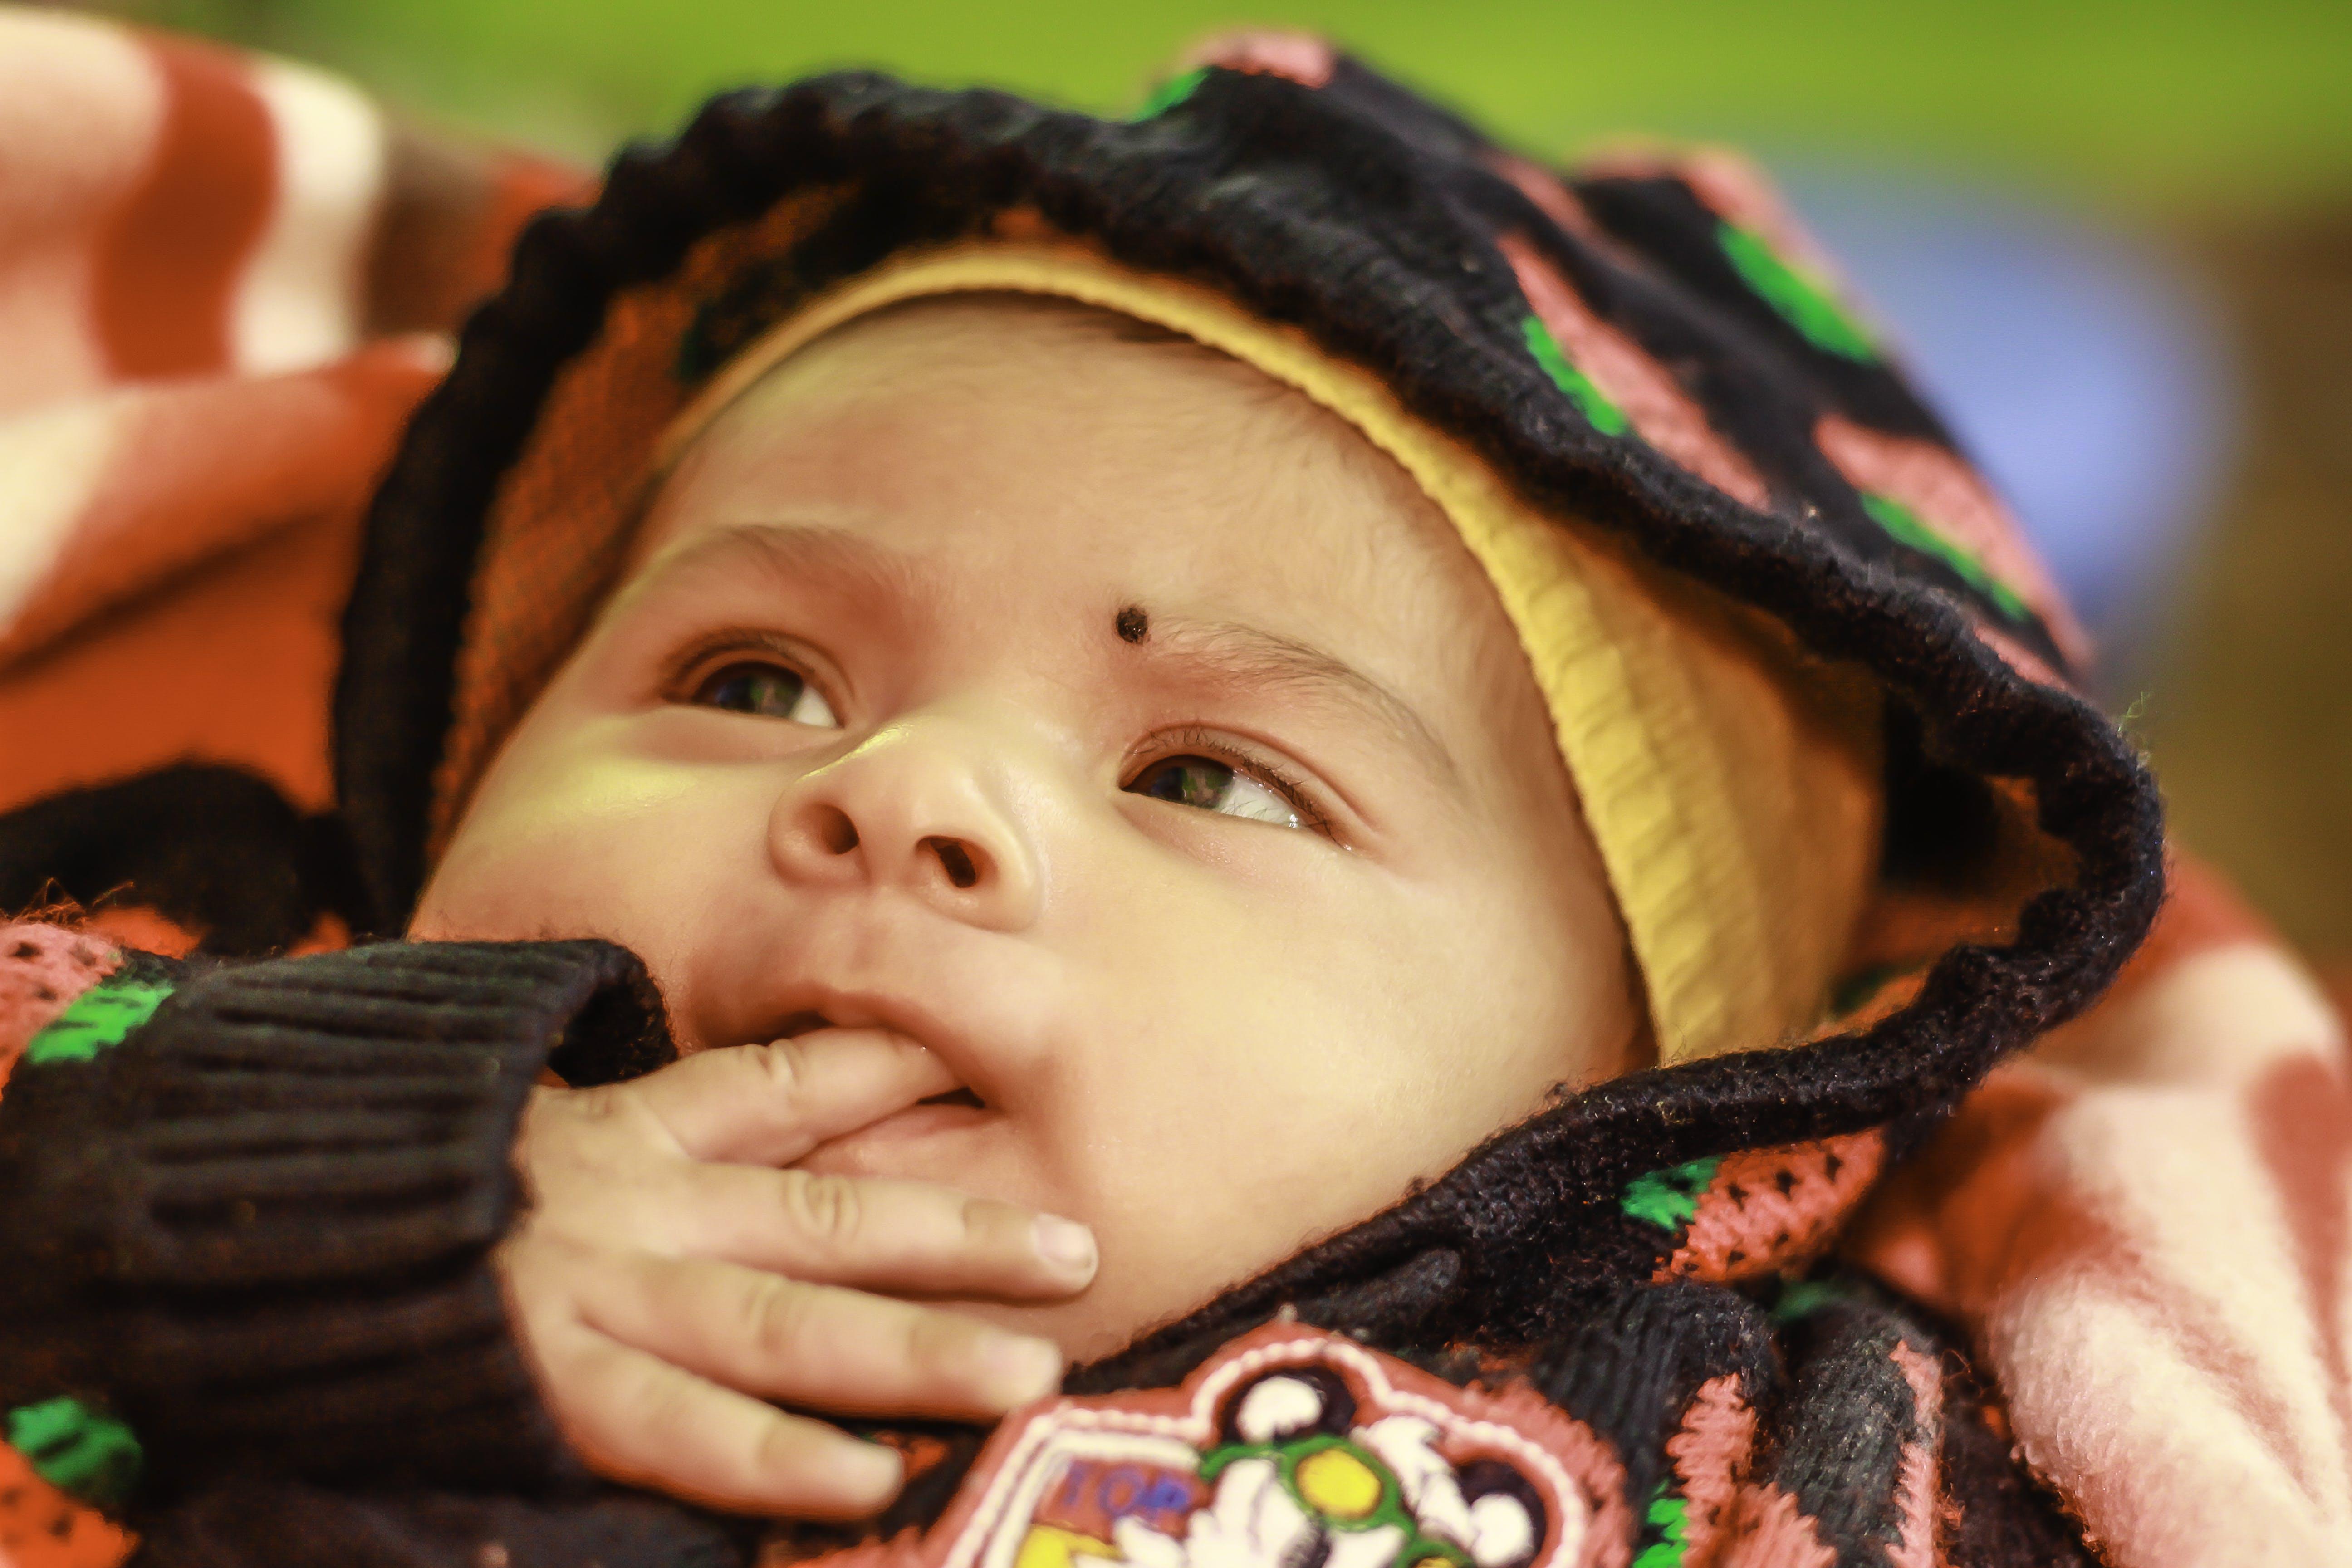 Free stock photo of #Amayara, baby girl, child, childhood